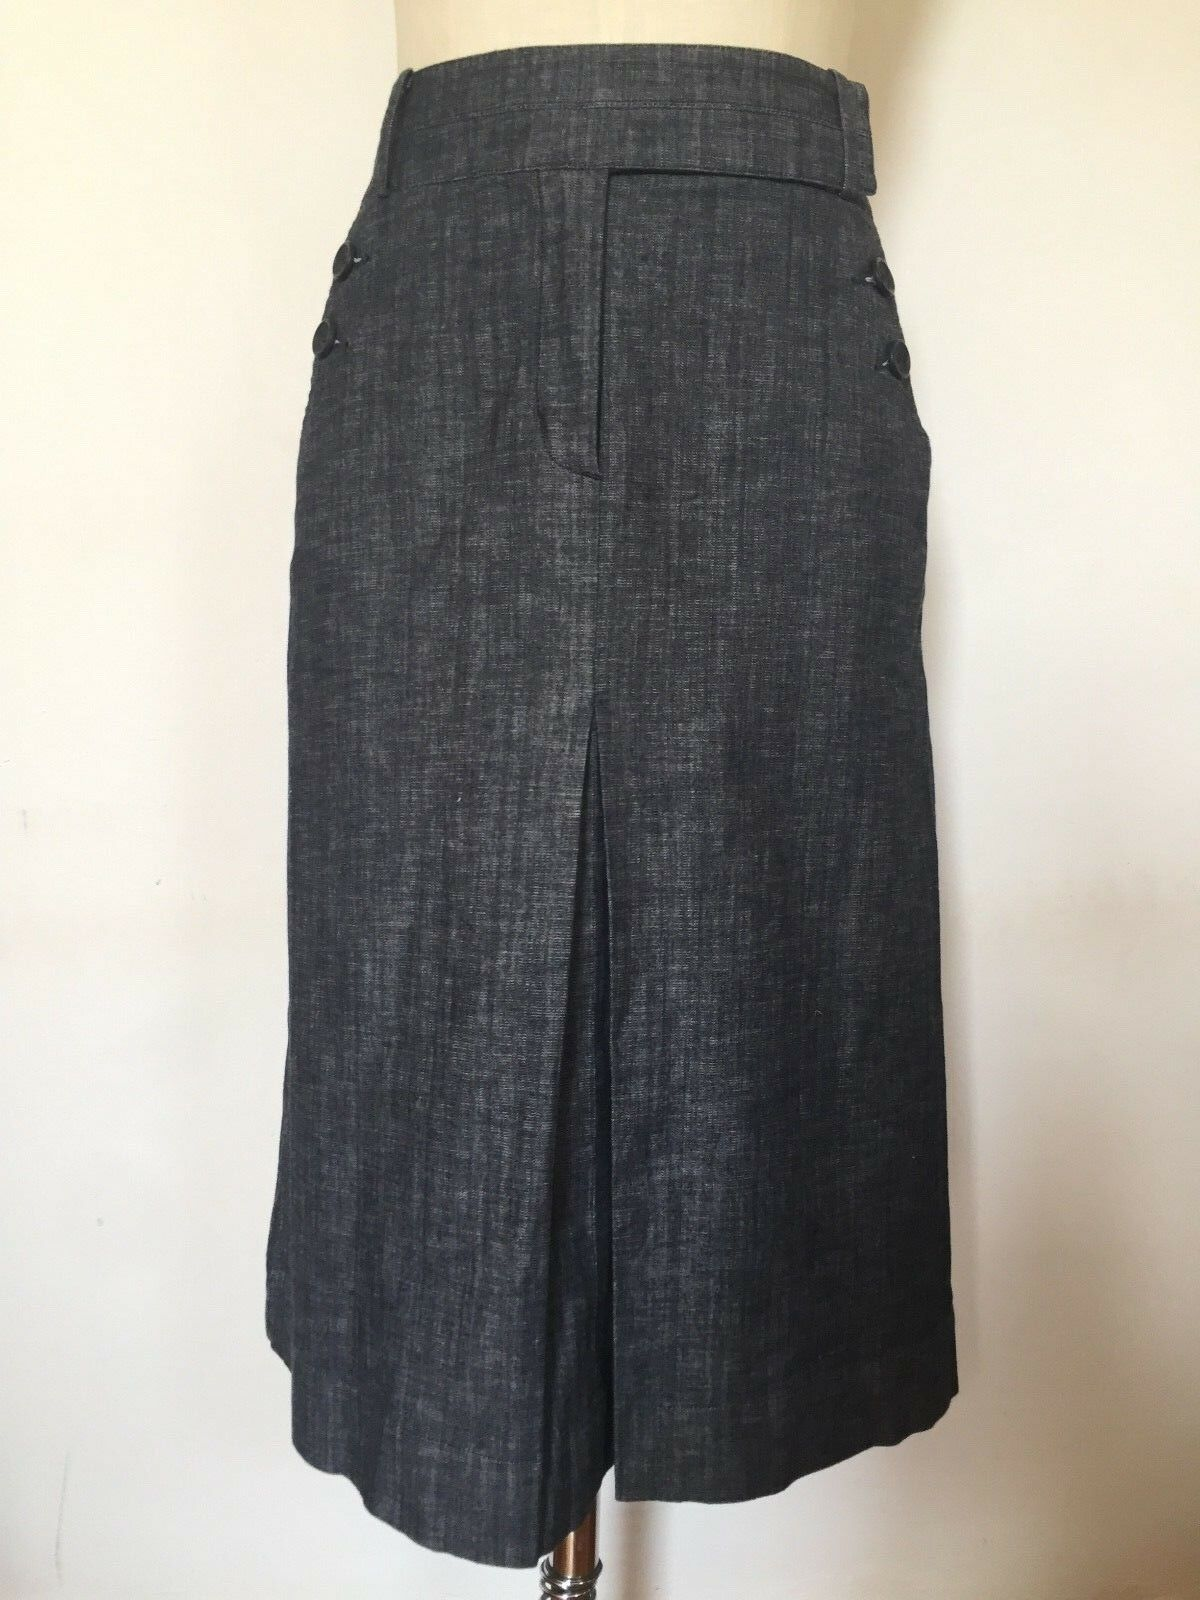 BNWOT Designer LAURA ASHLEY Soft Wash A Line & Pleat Detail Denim Skirt 12